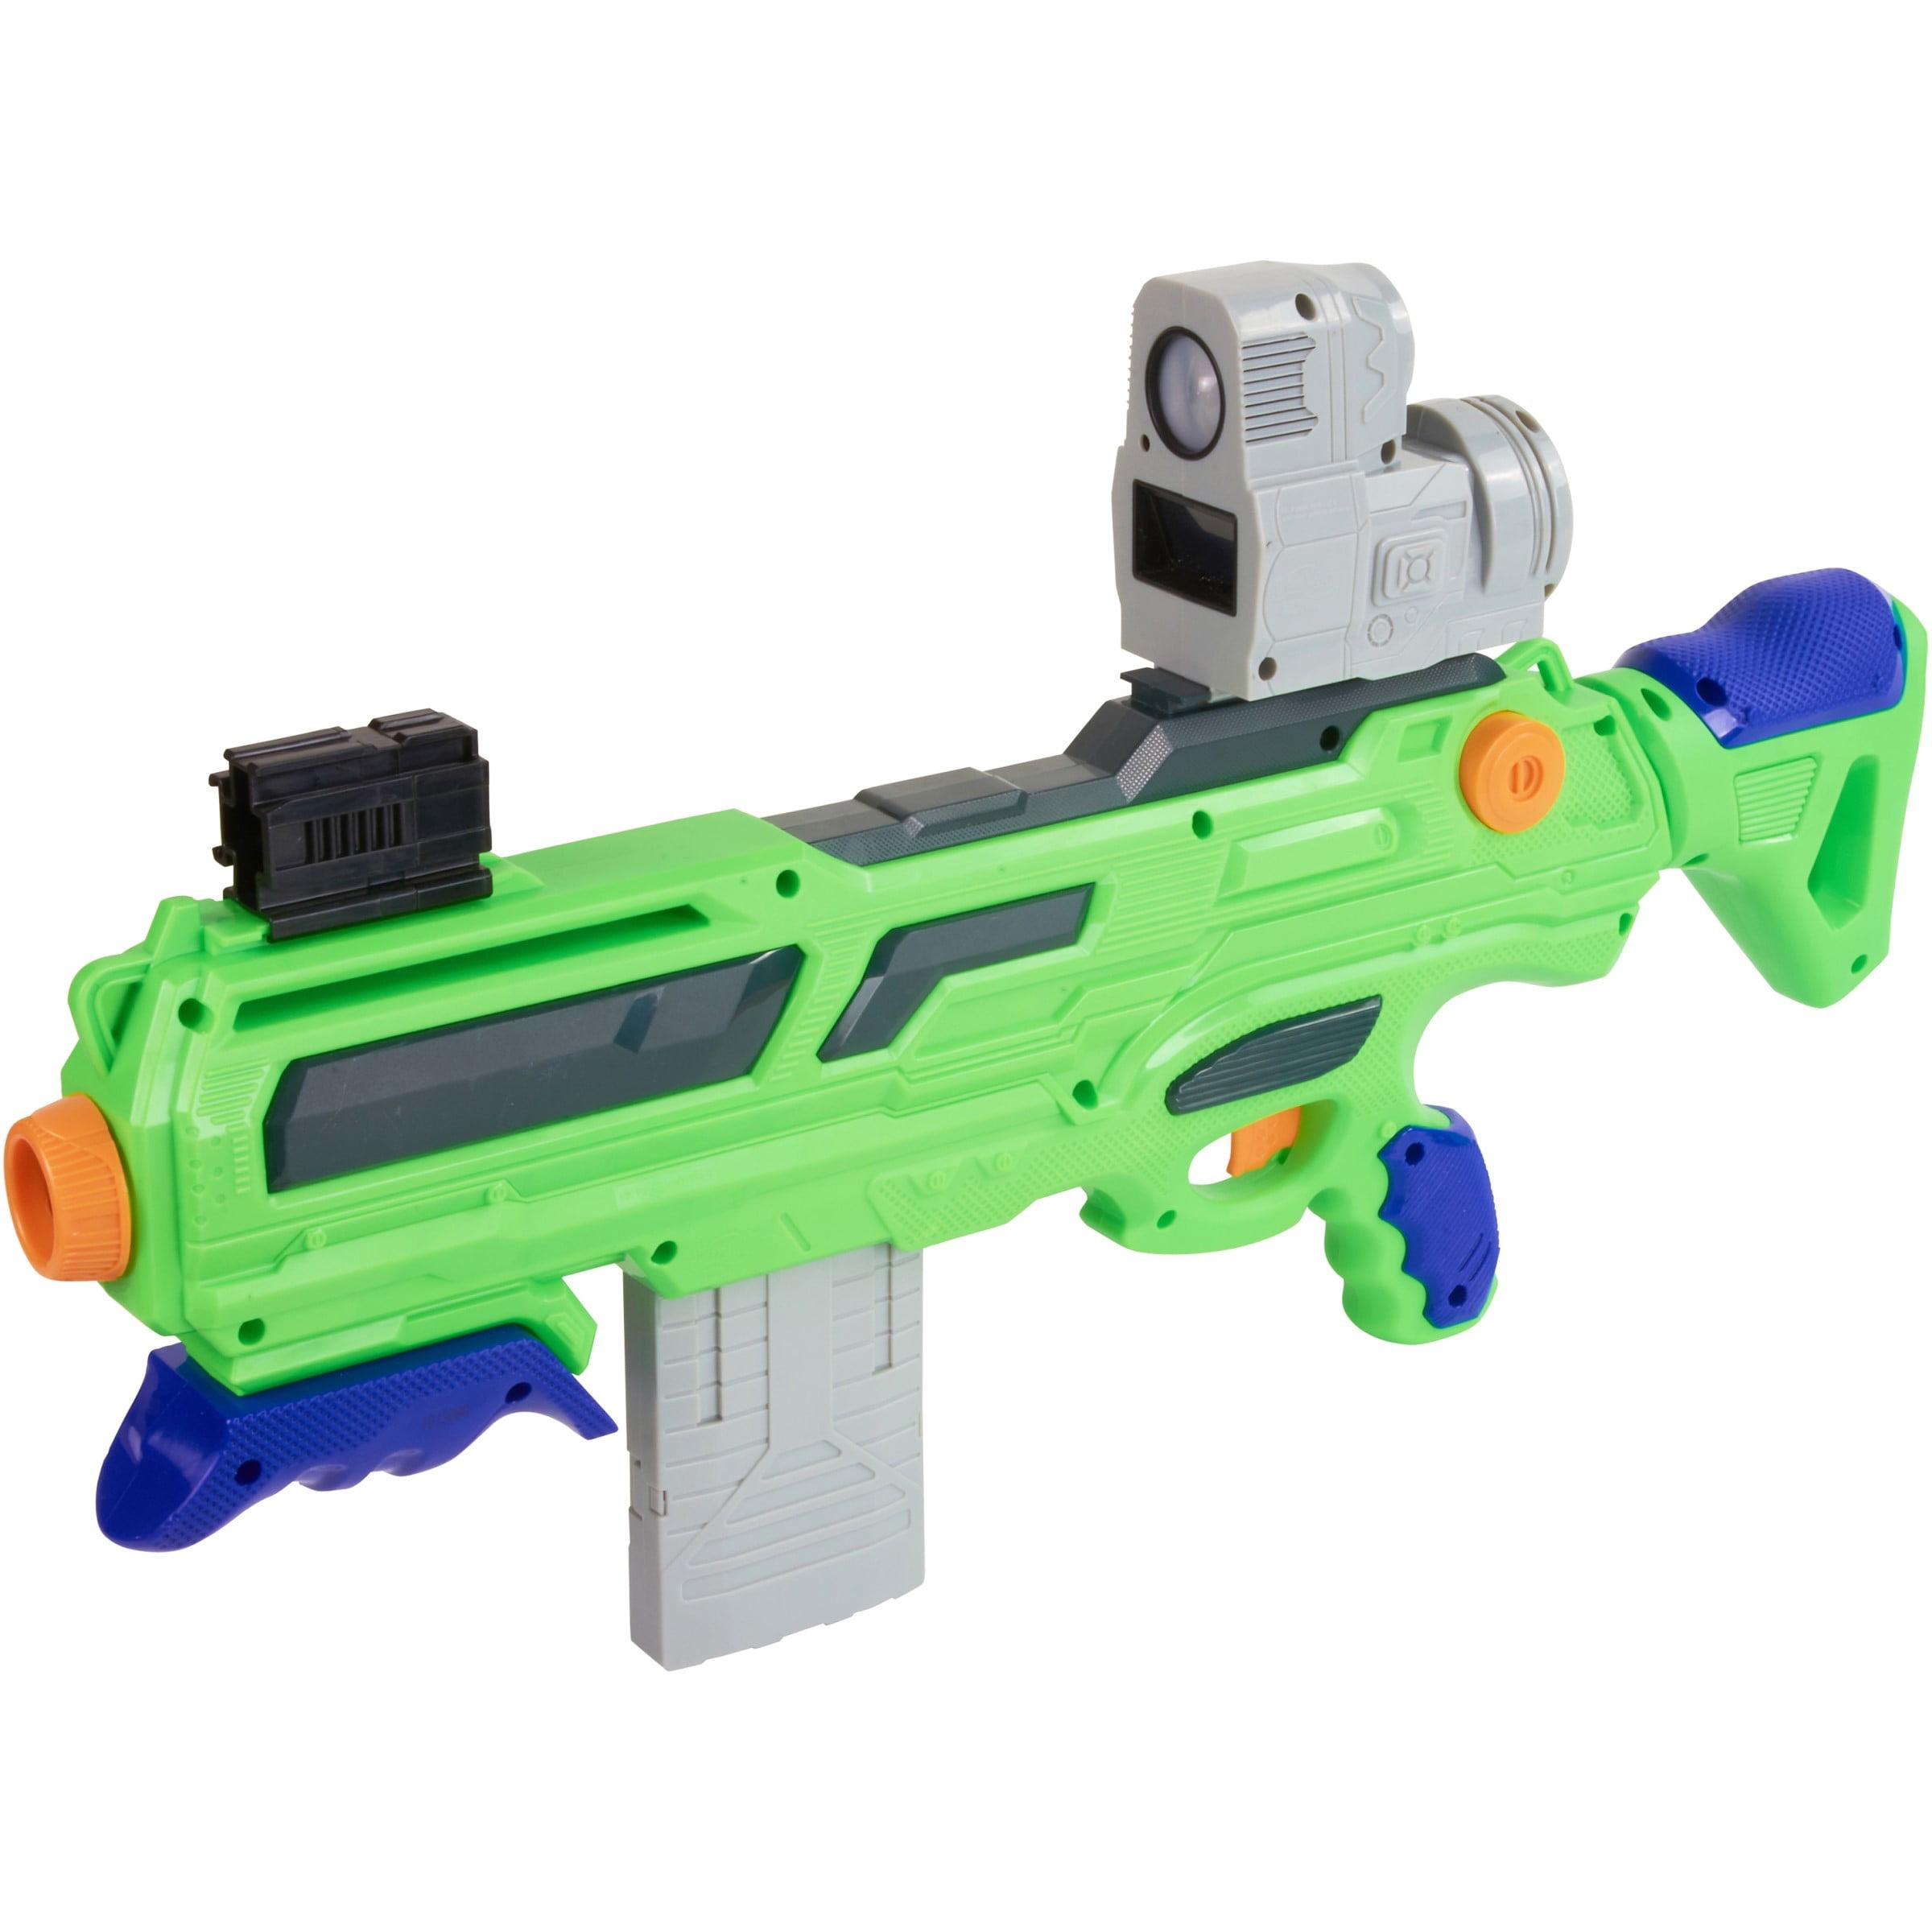 Adventure Force Thermal Tracker Bolt Action Blaster With Heat Seeking Scope Walmart Com Walmart Com